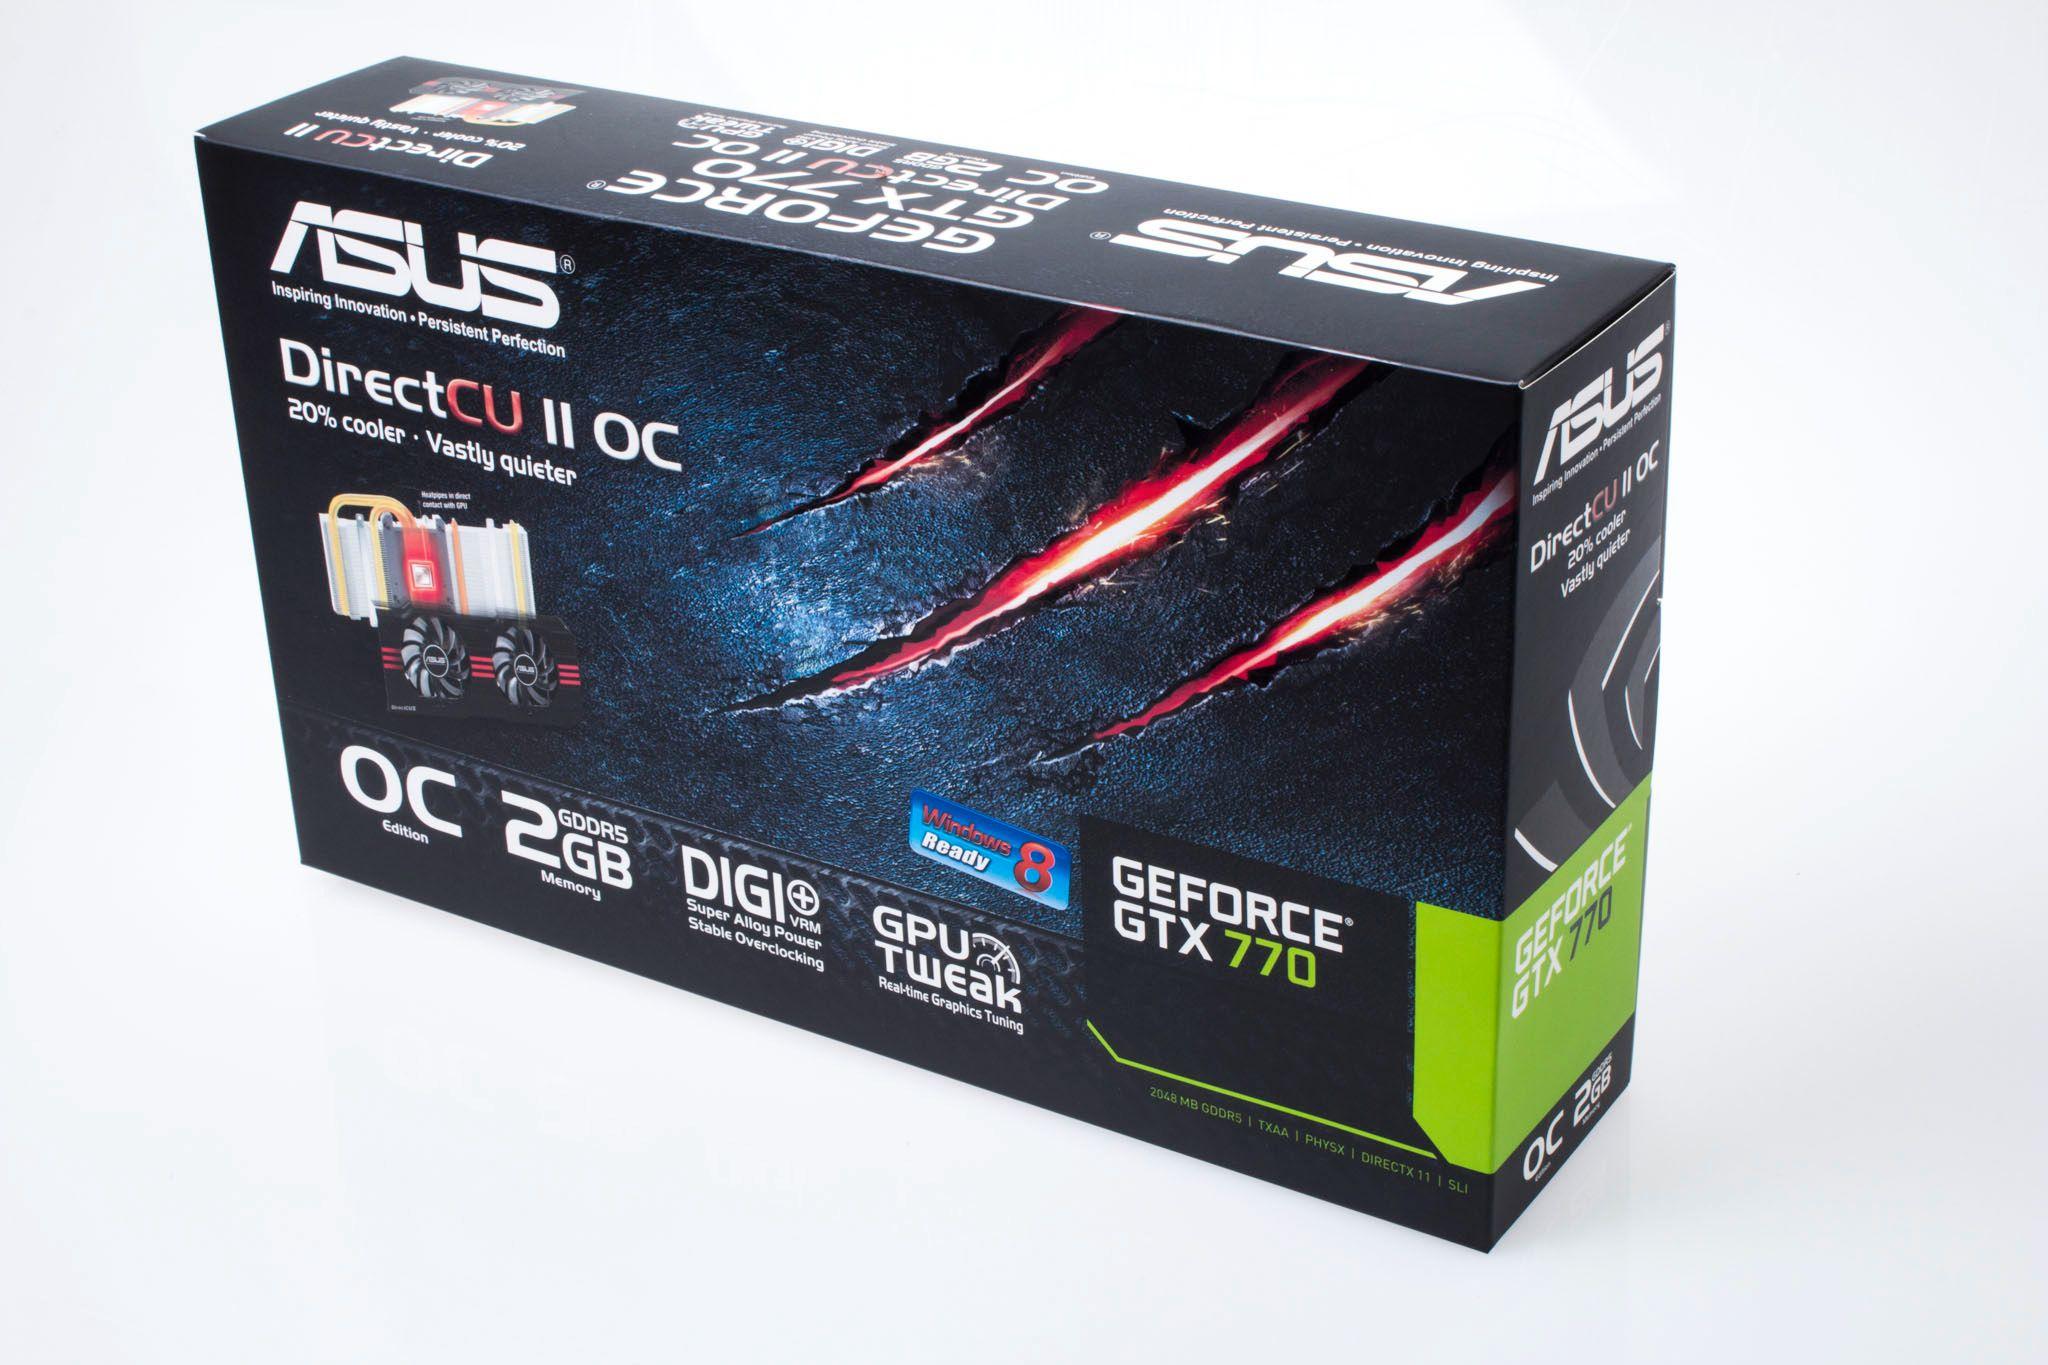 Asus GeForce GTX 770 DirectCU II OC: Produkteske.Foto: Varg Aamo, Hardware.no